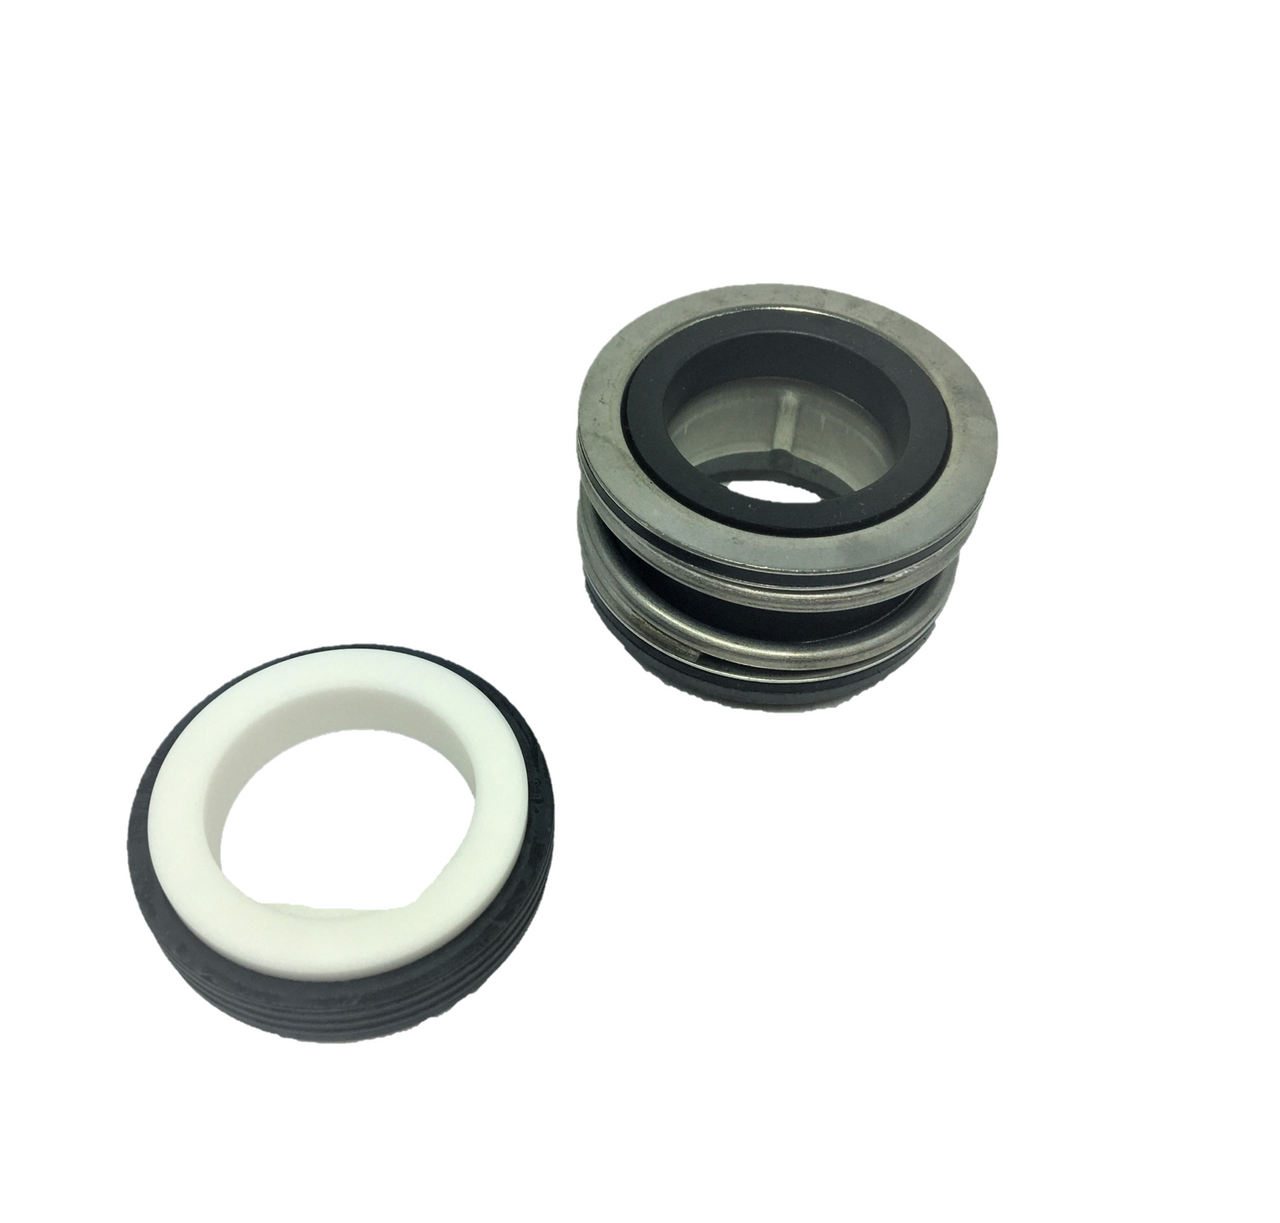 Aquamiser + Seal Kit, LP Pump, SS, Noryl Series 43-4947